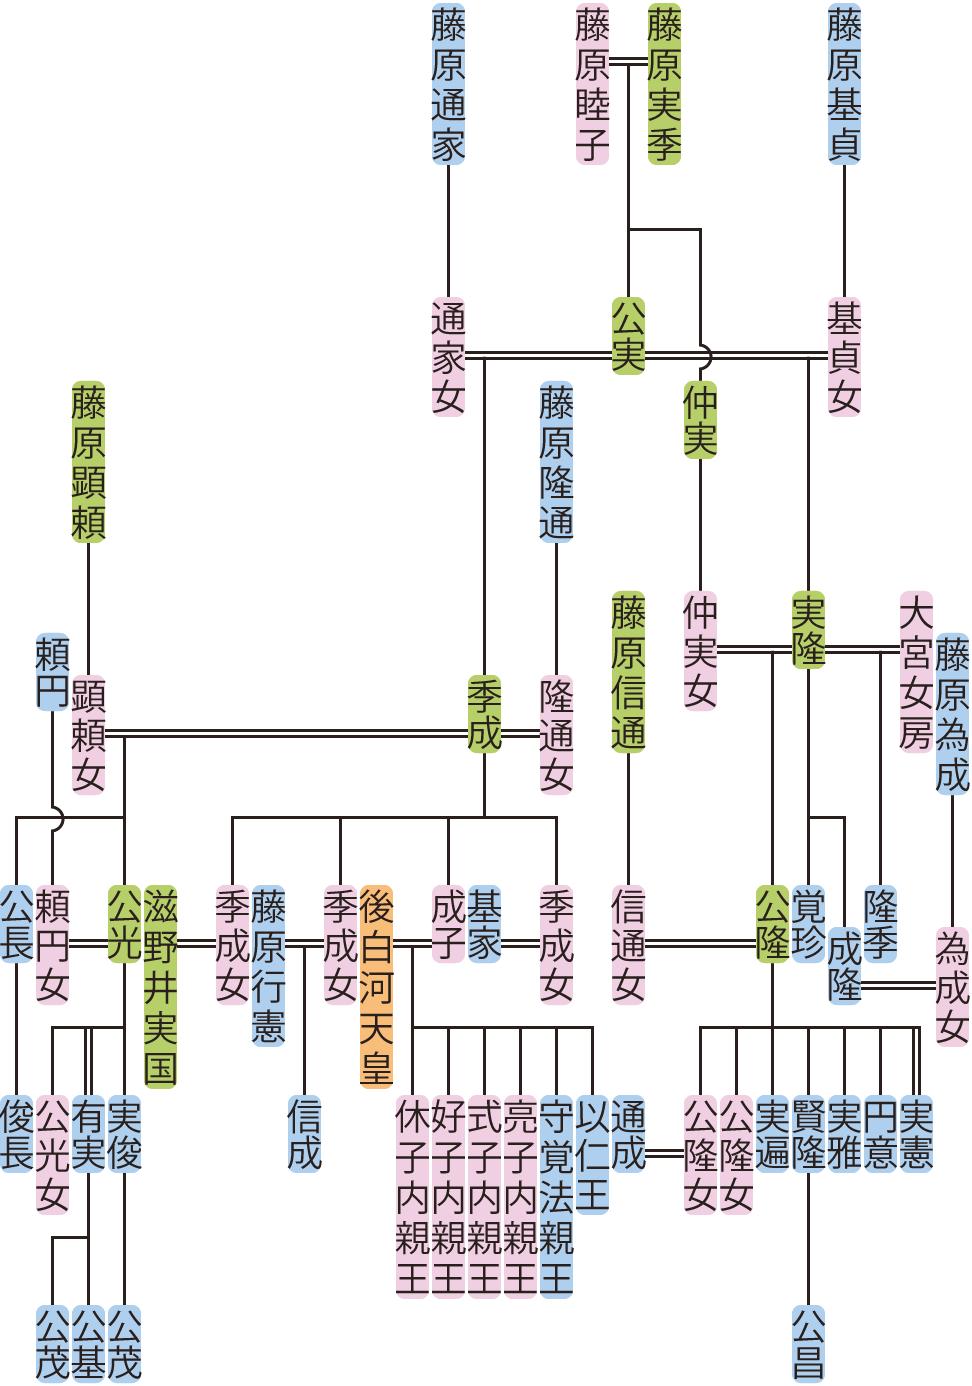 藤原実隆・季成の系図